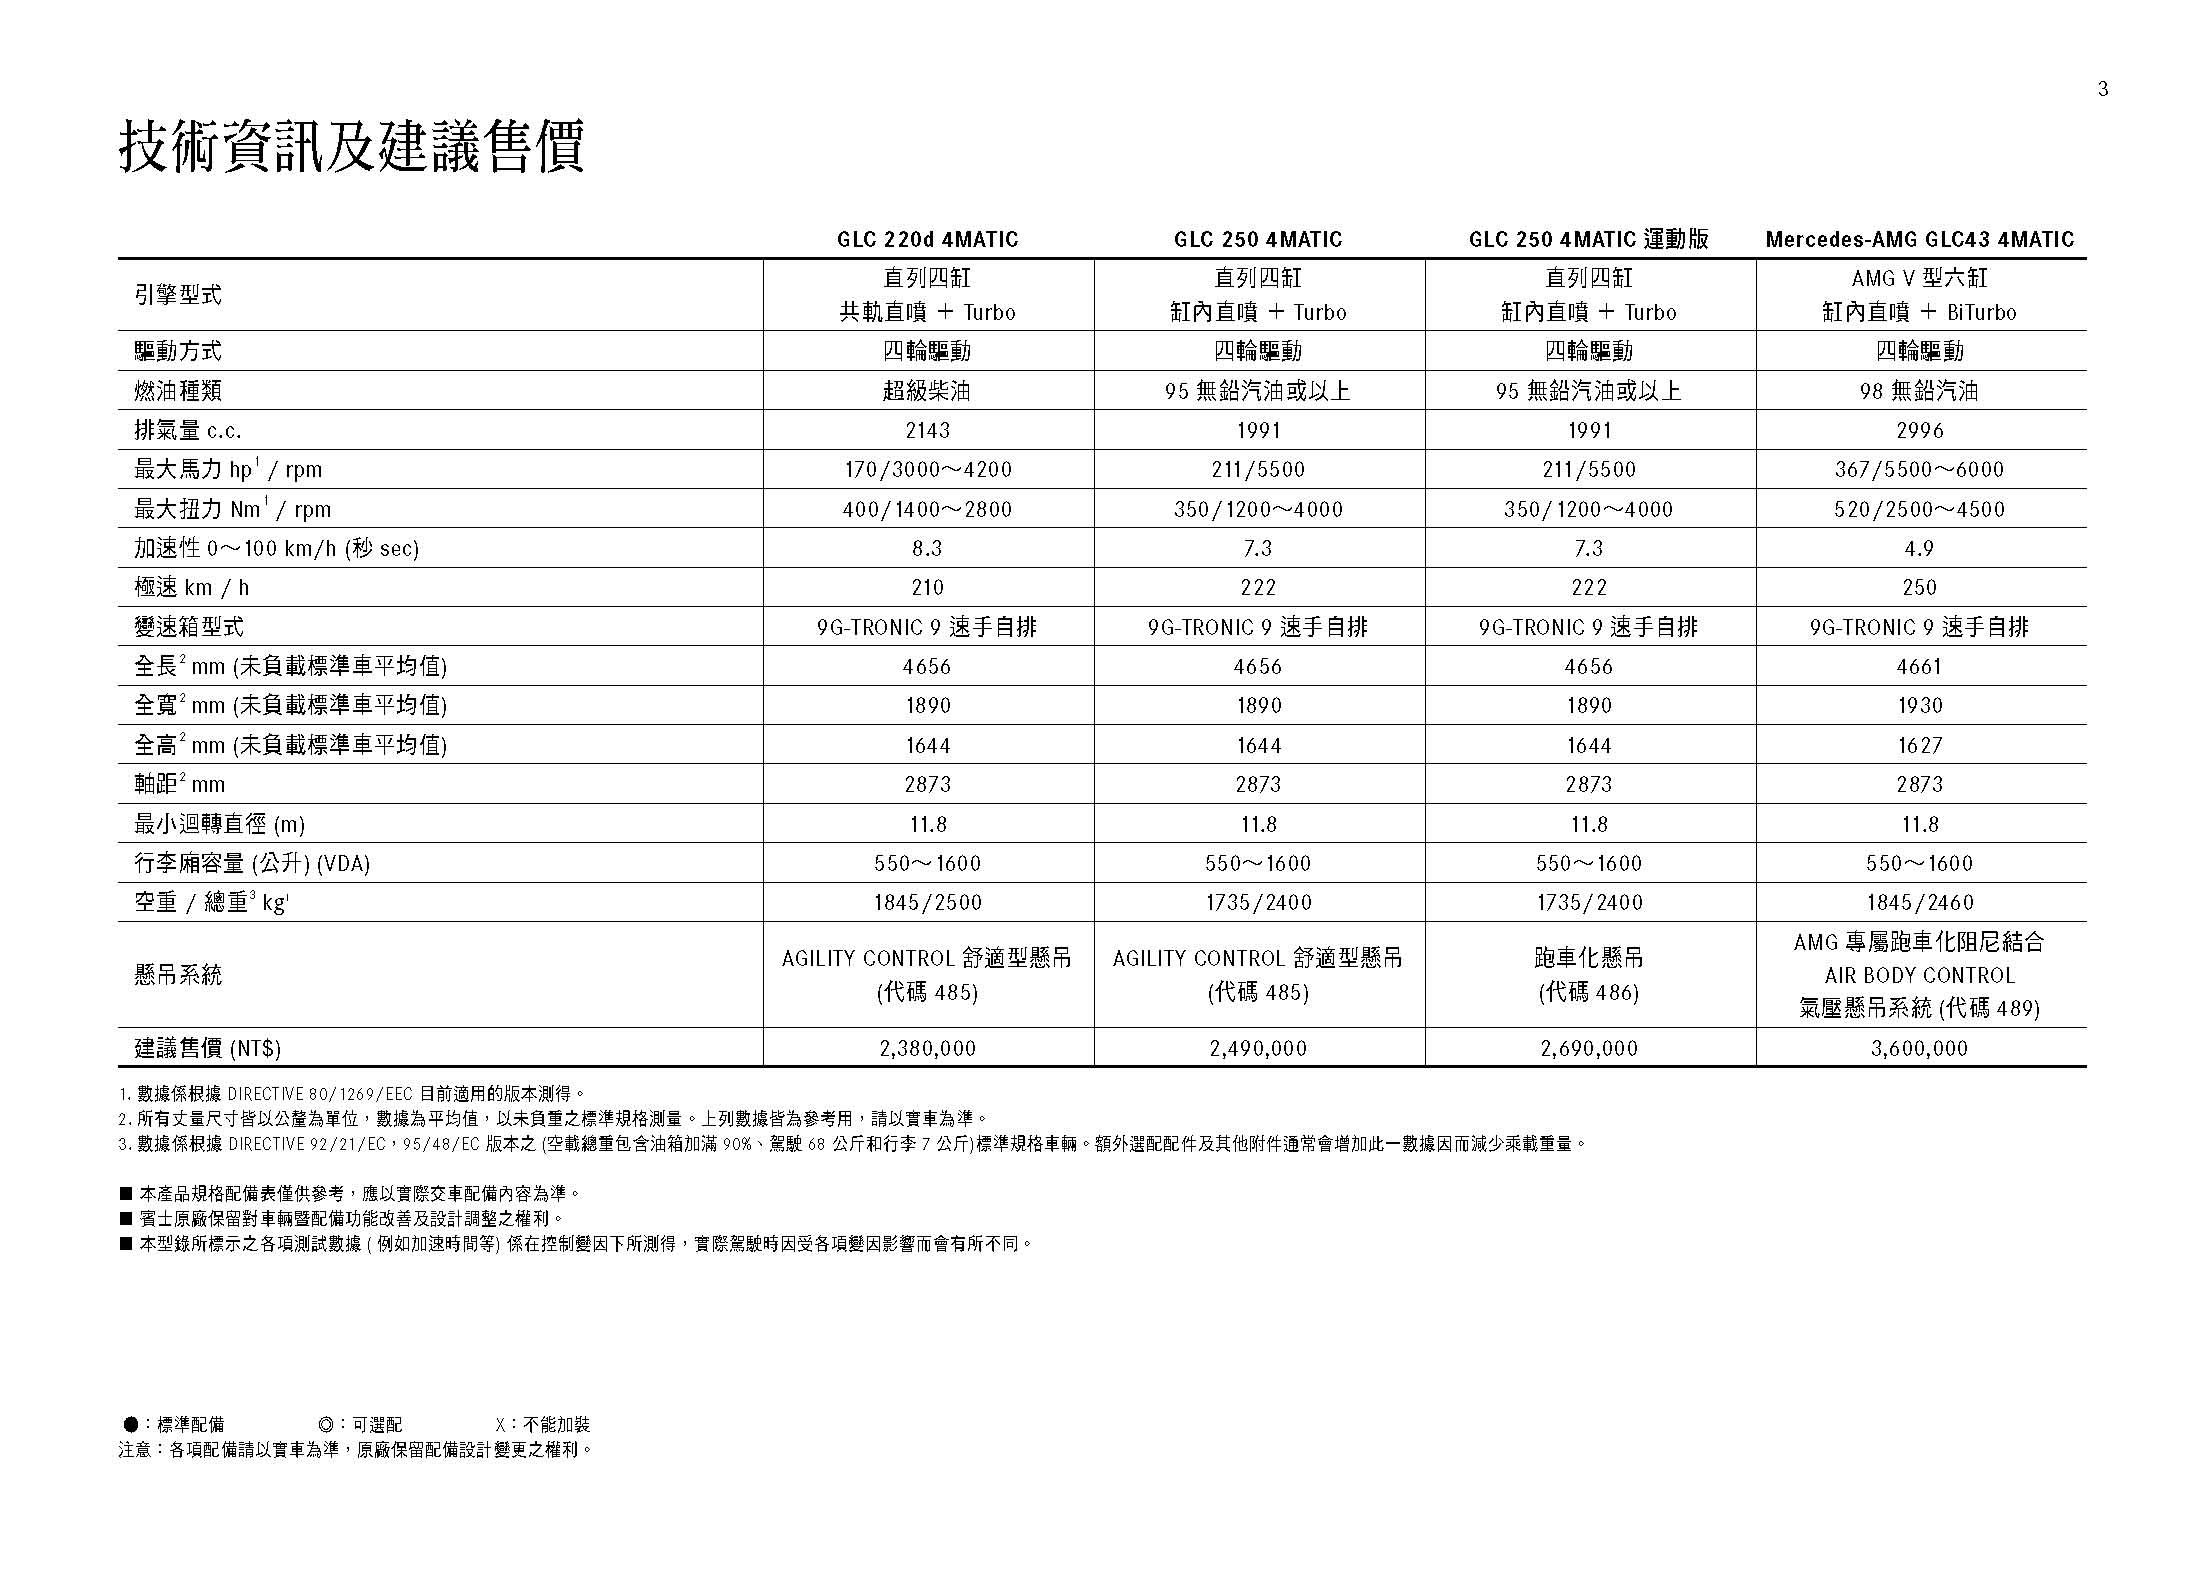 MY1718_GLC規格配備表20170929_頁面_03